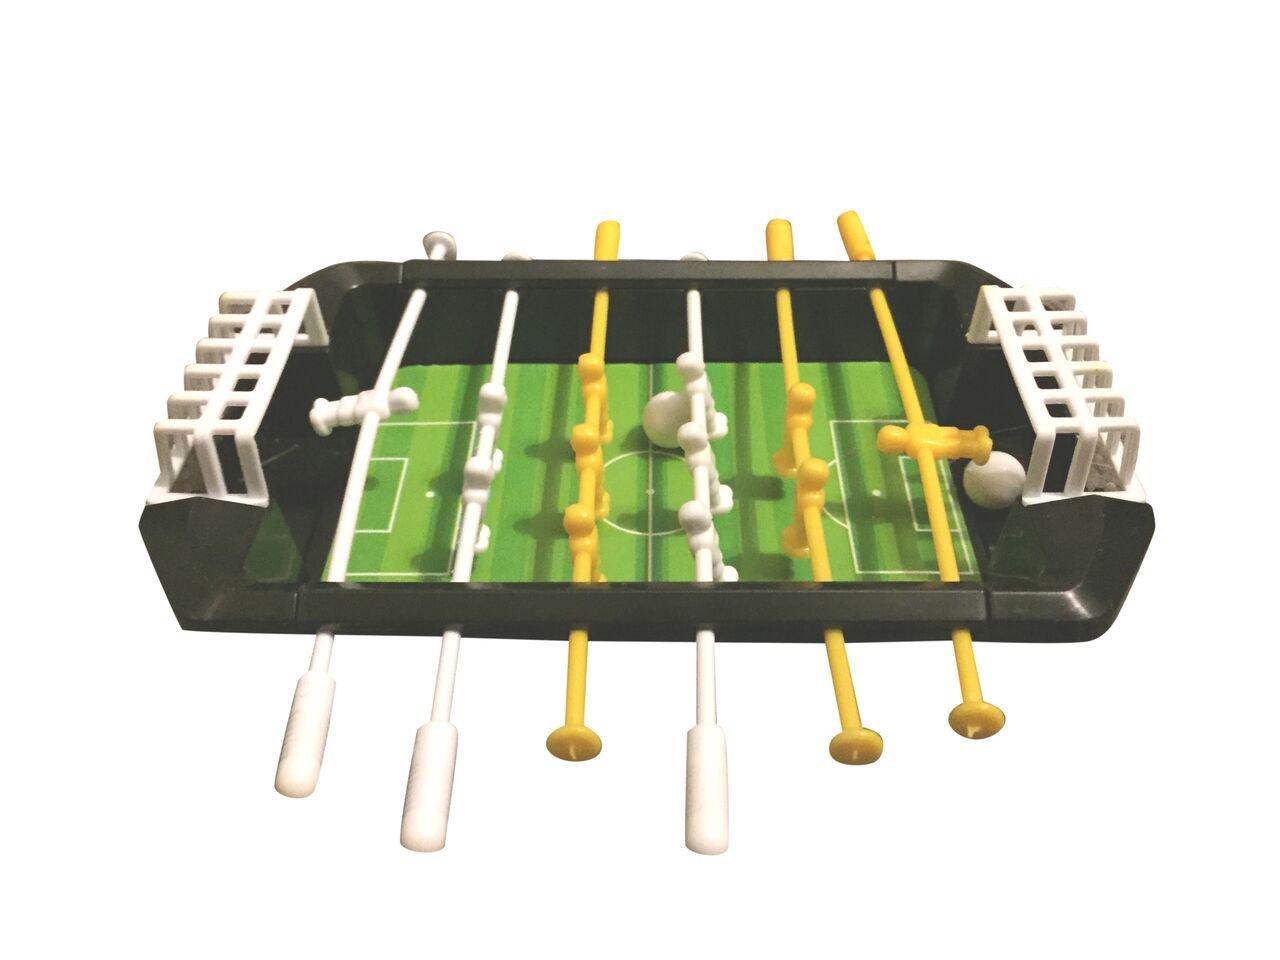 Amazoncom Mini Finger Soccer Foosball Desktop Table Game Pack Of - Gamepower foosball table